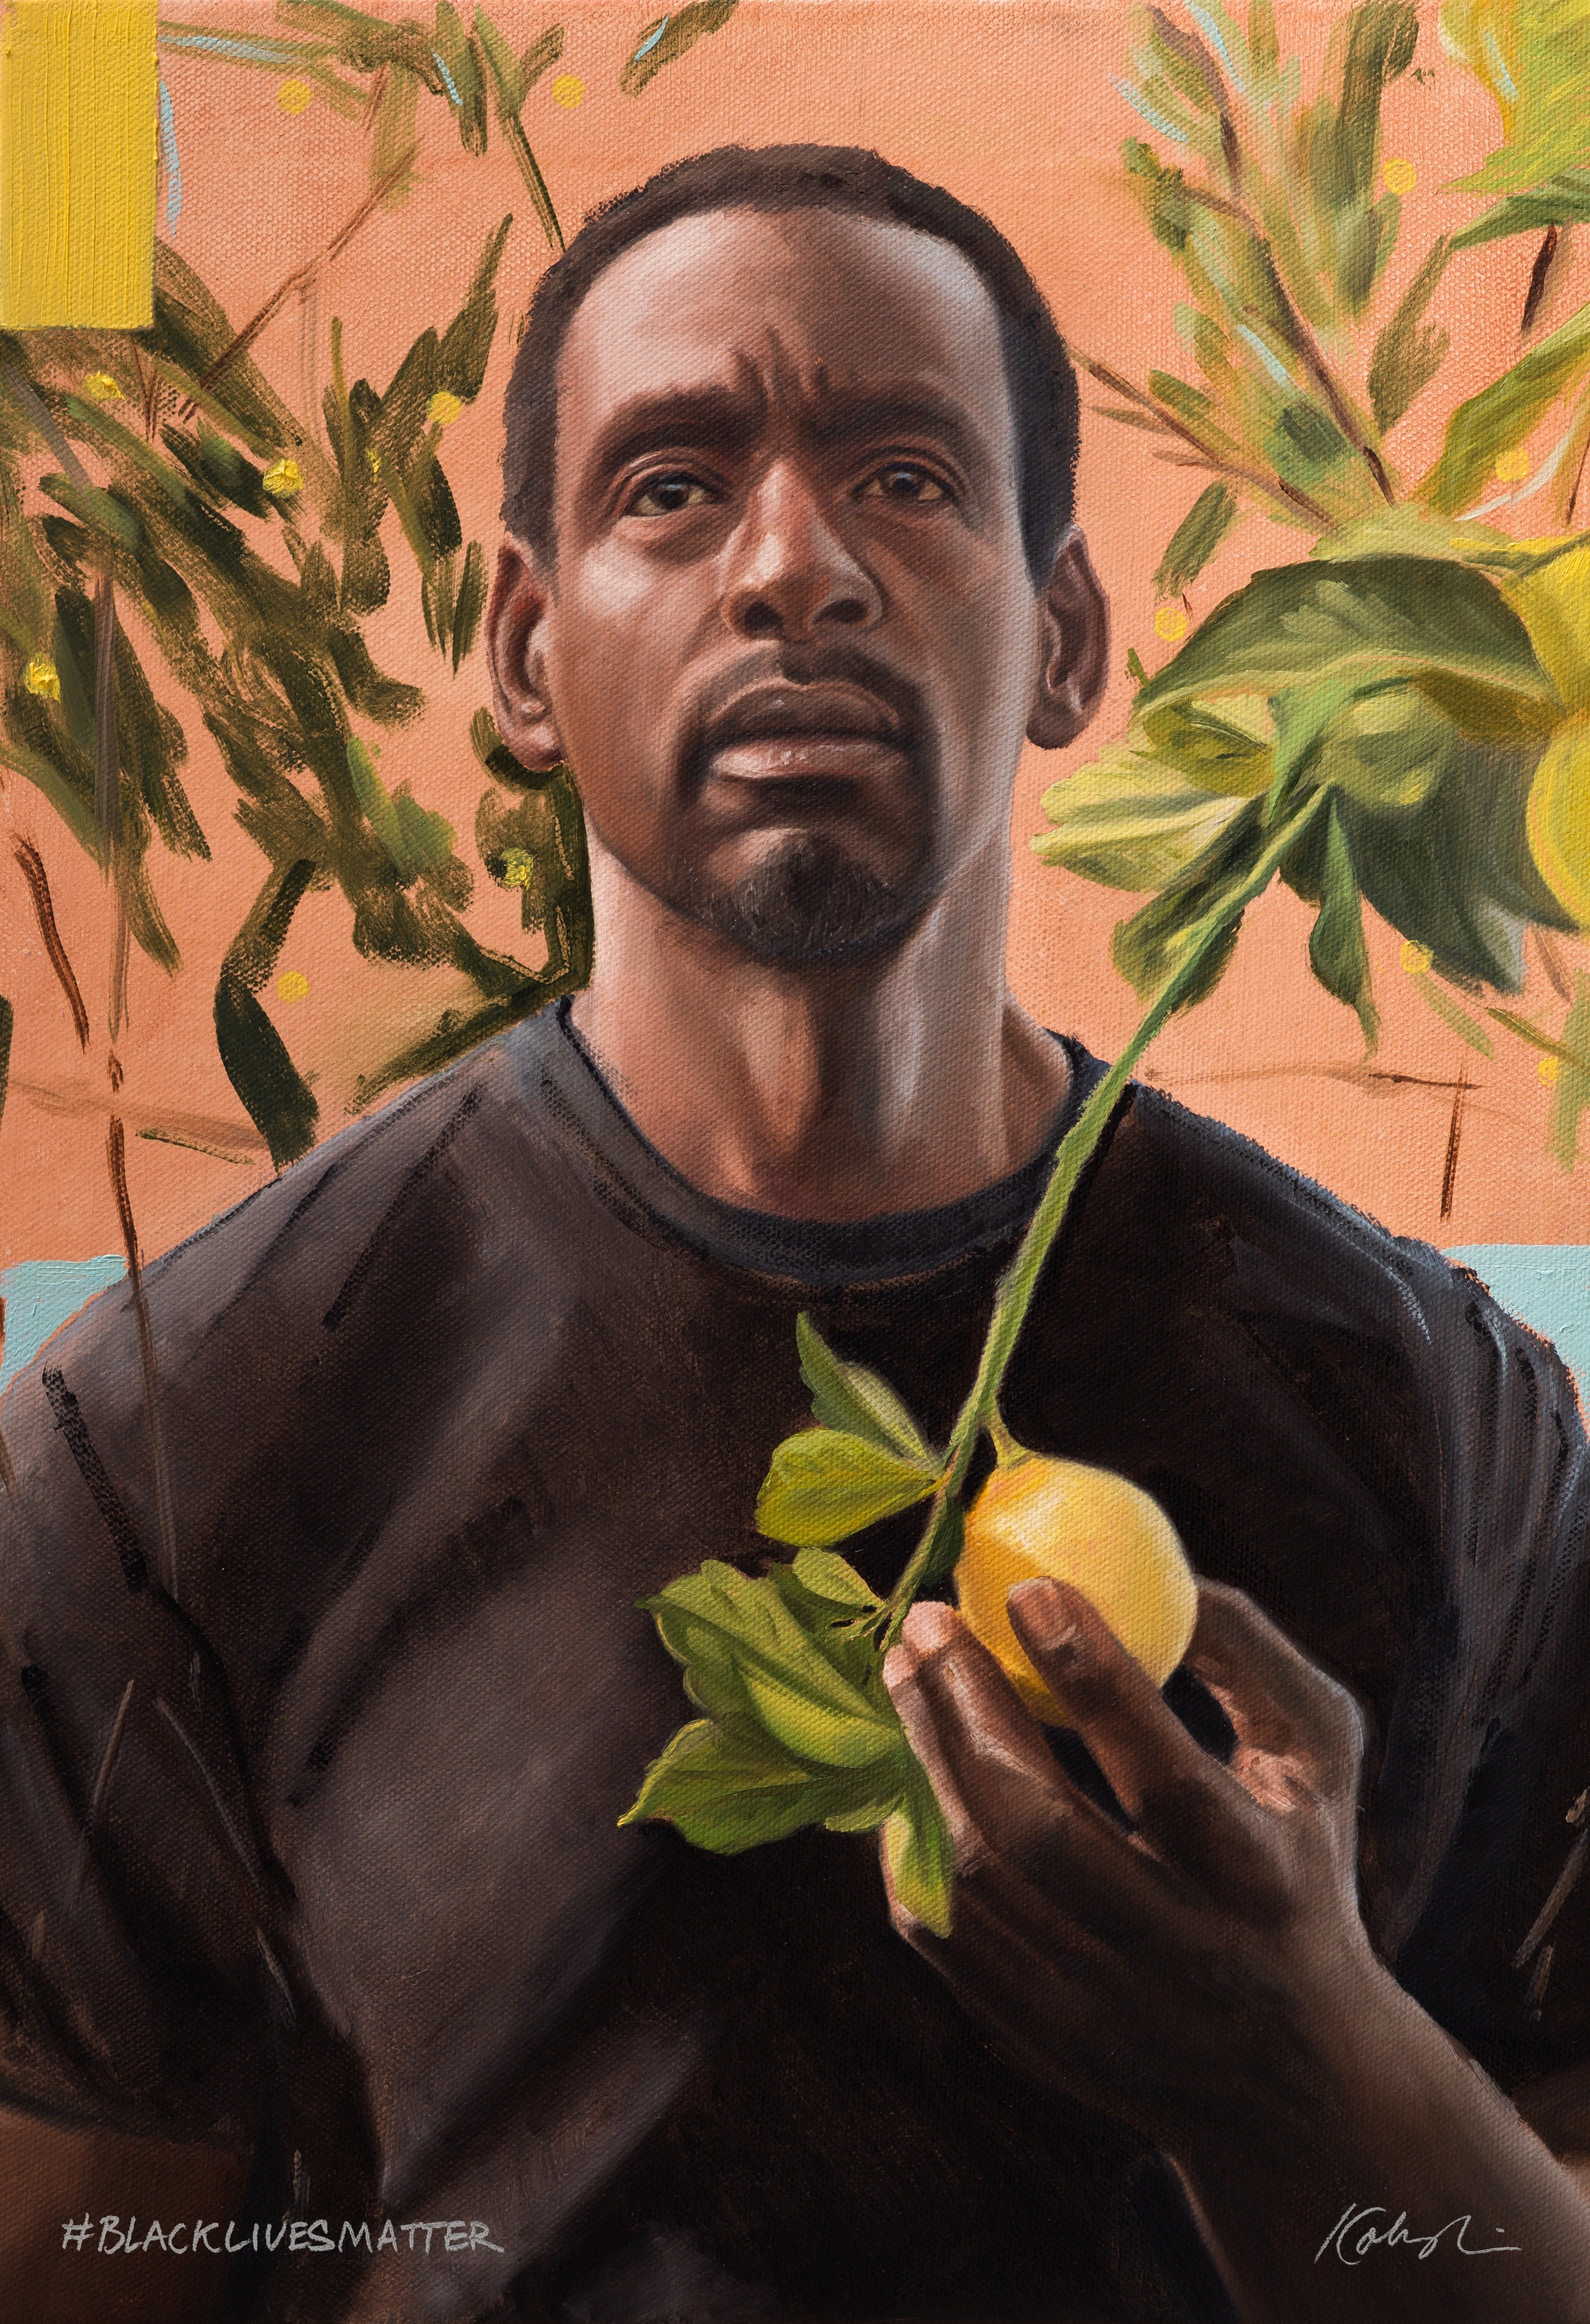 """When Life Gives You Lemons""by <a href=""http://www.kohshinfinley.com"" target=""_blank"">Kohshin Finley</a>"